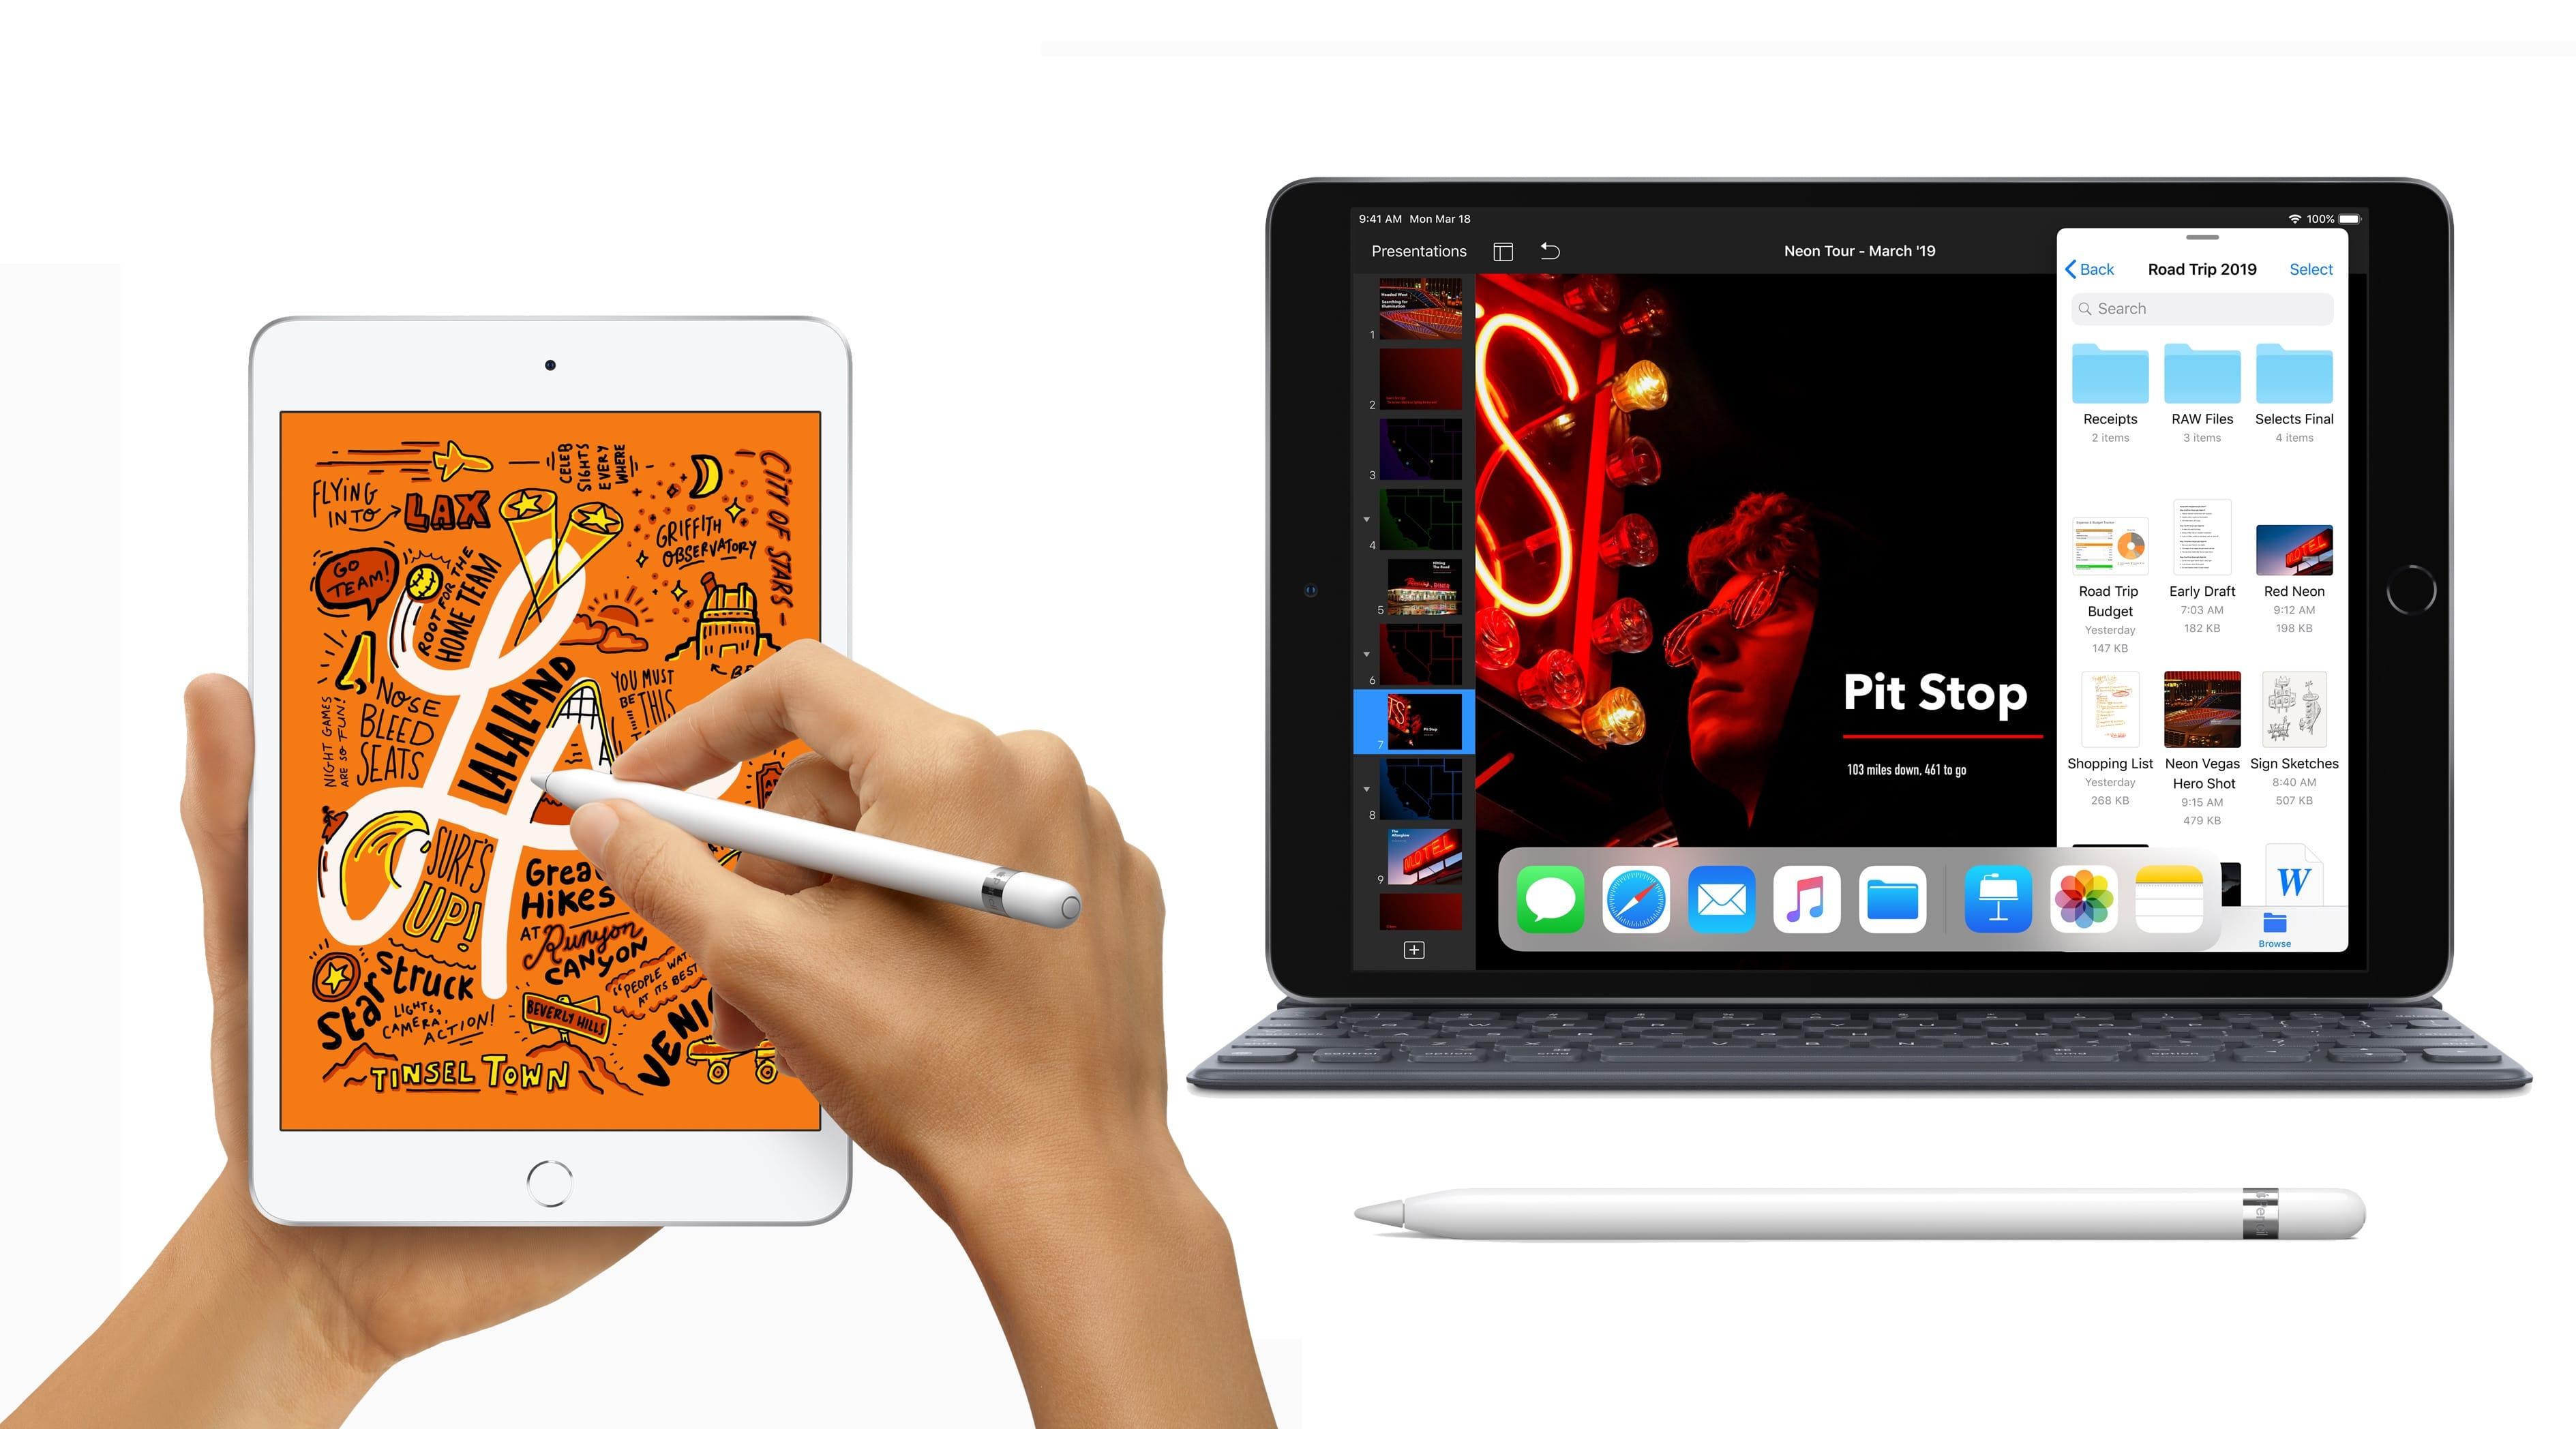 A Look Inside the New iPad Air